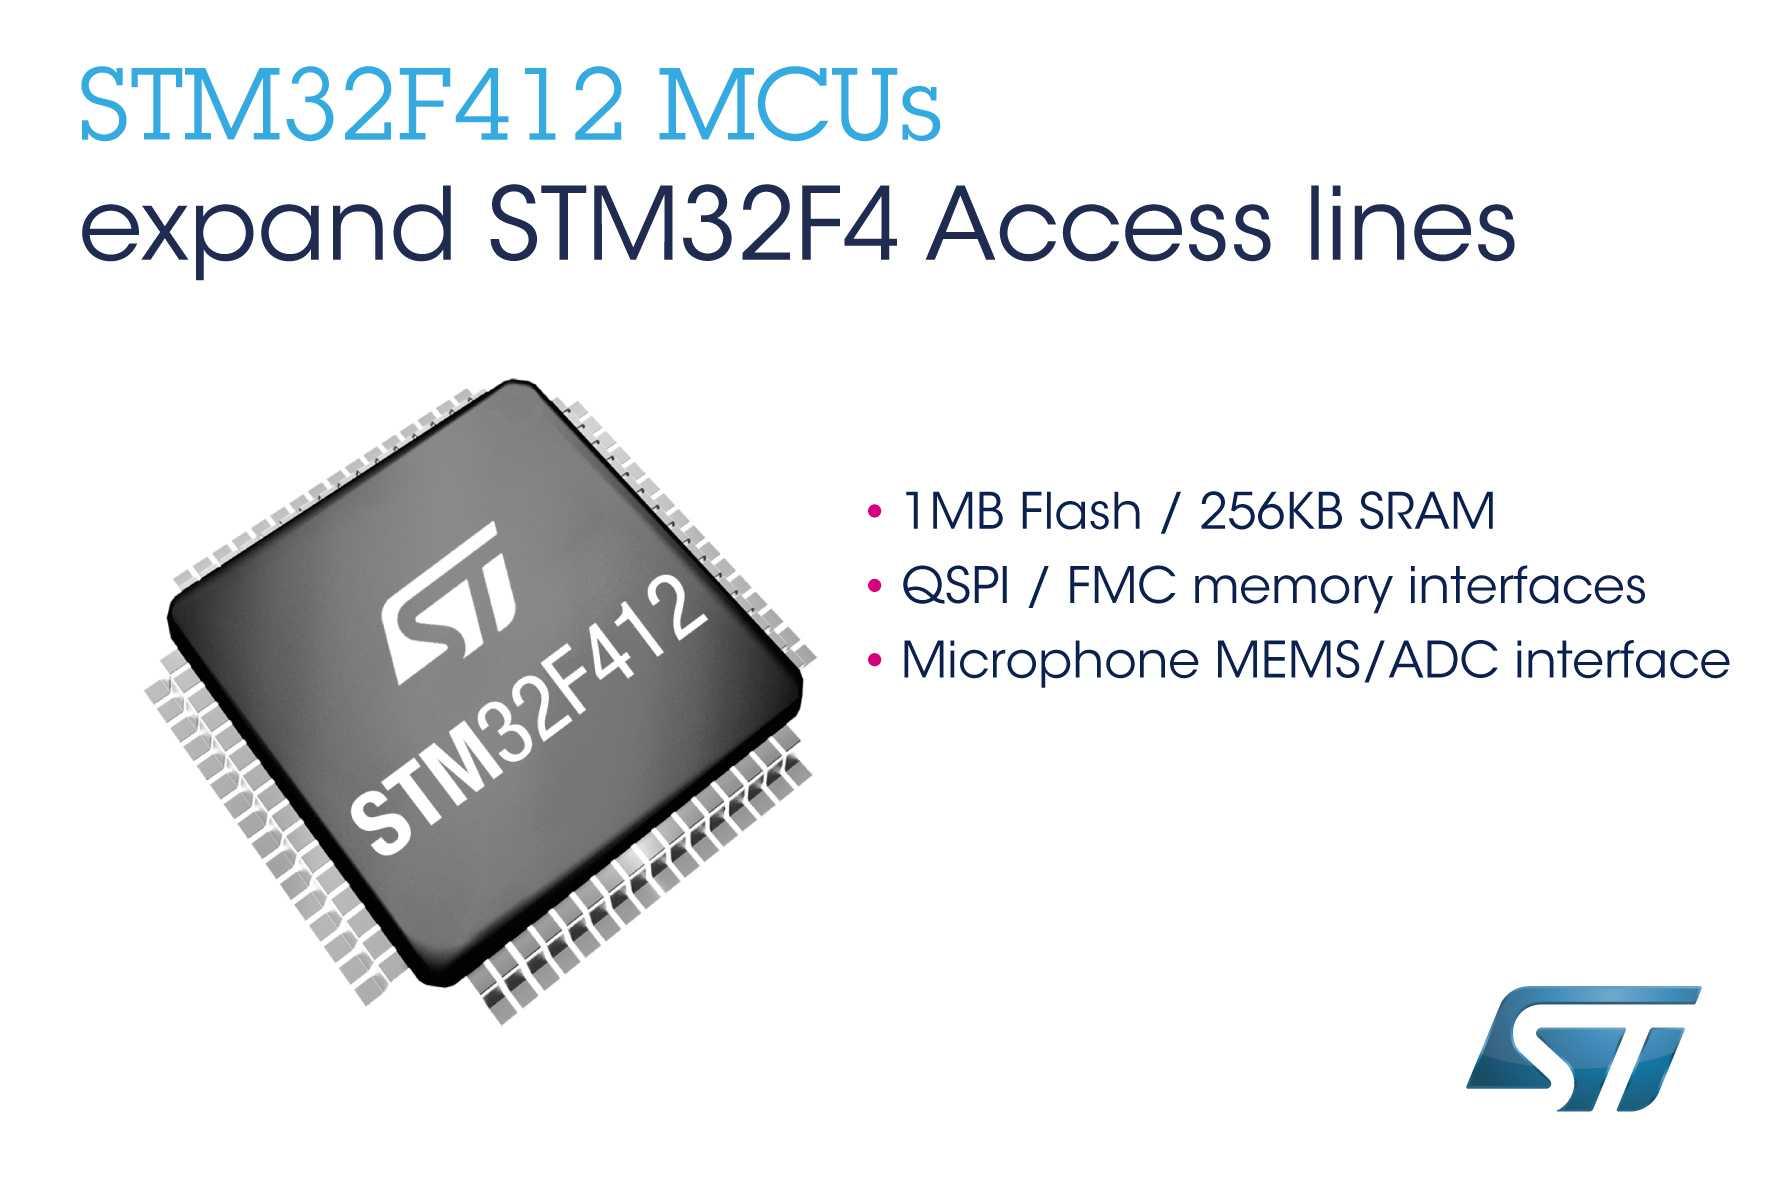 STM32F412 MCUs expand STM32F4 Access lines